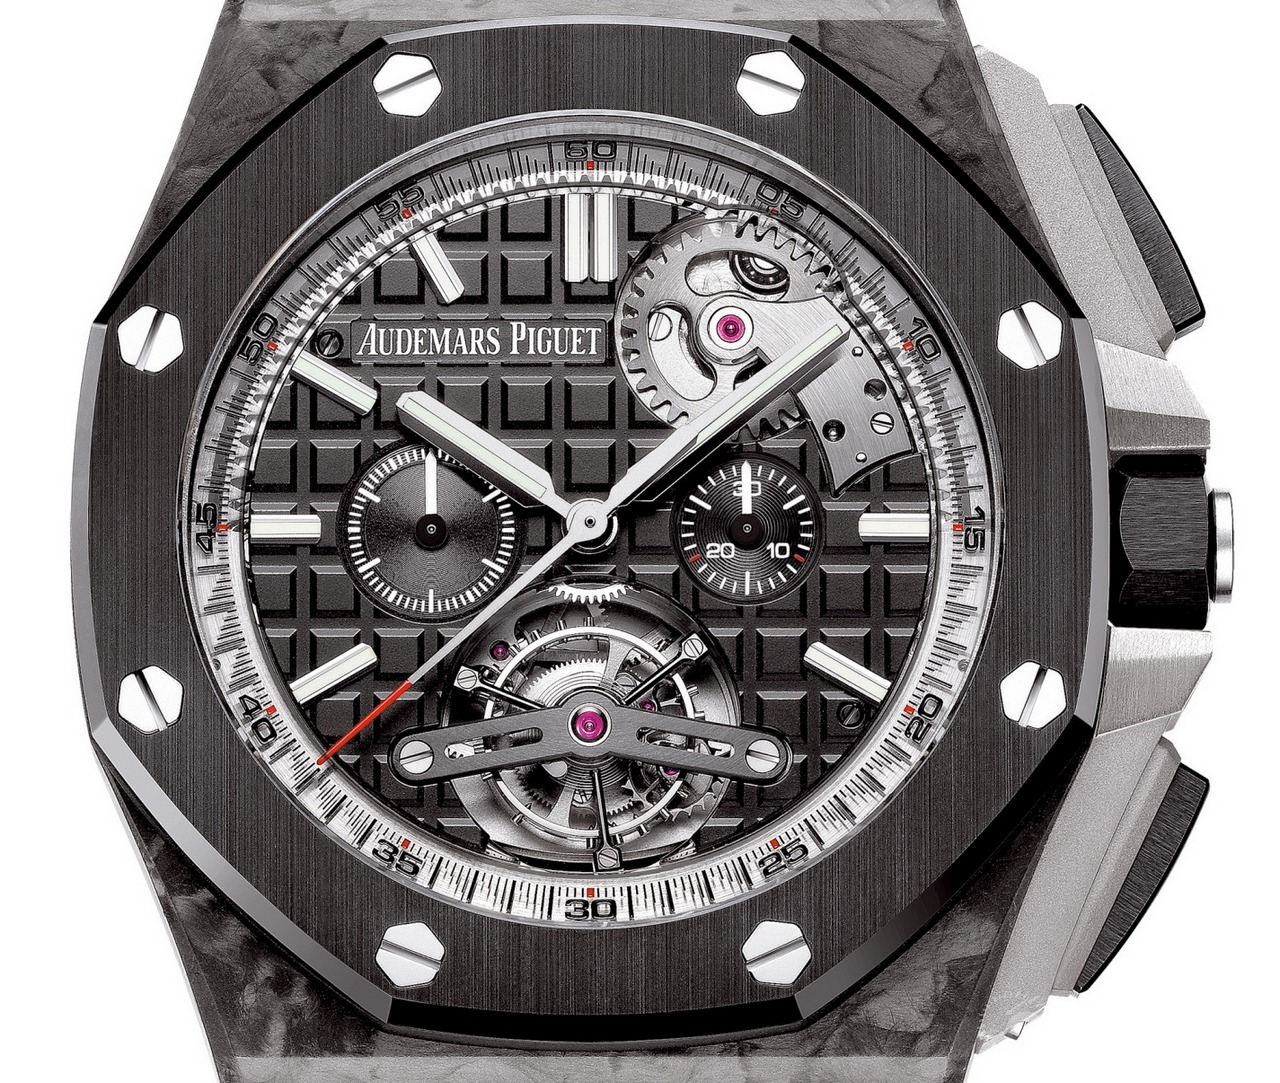 anteprima-watches-wonders-2014-hong-kong-audemars-piguet-royal-oak-offshore-tourbillon-cronografo-automatico-0-100_3